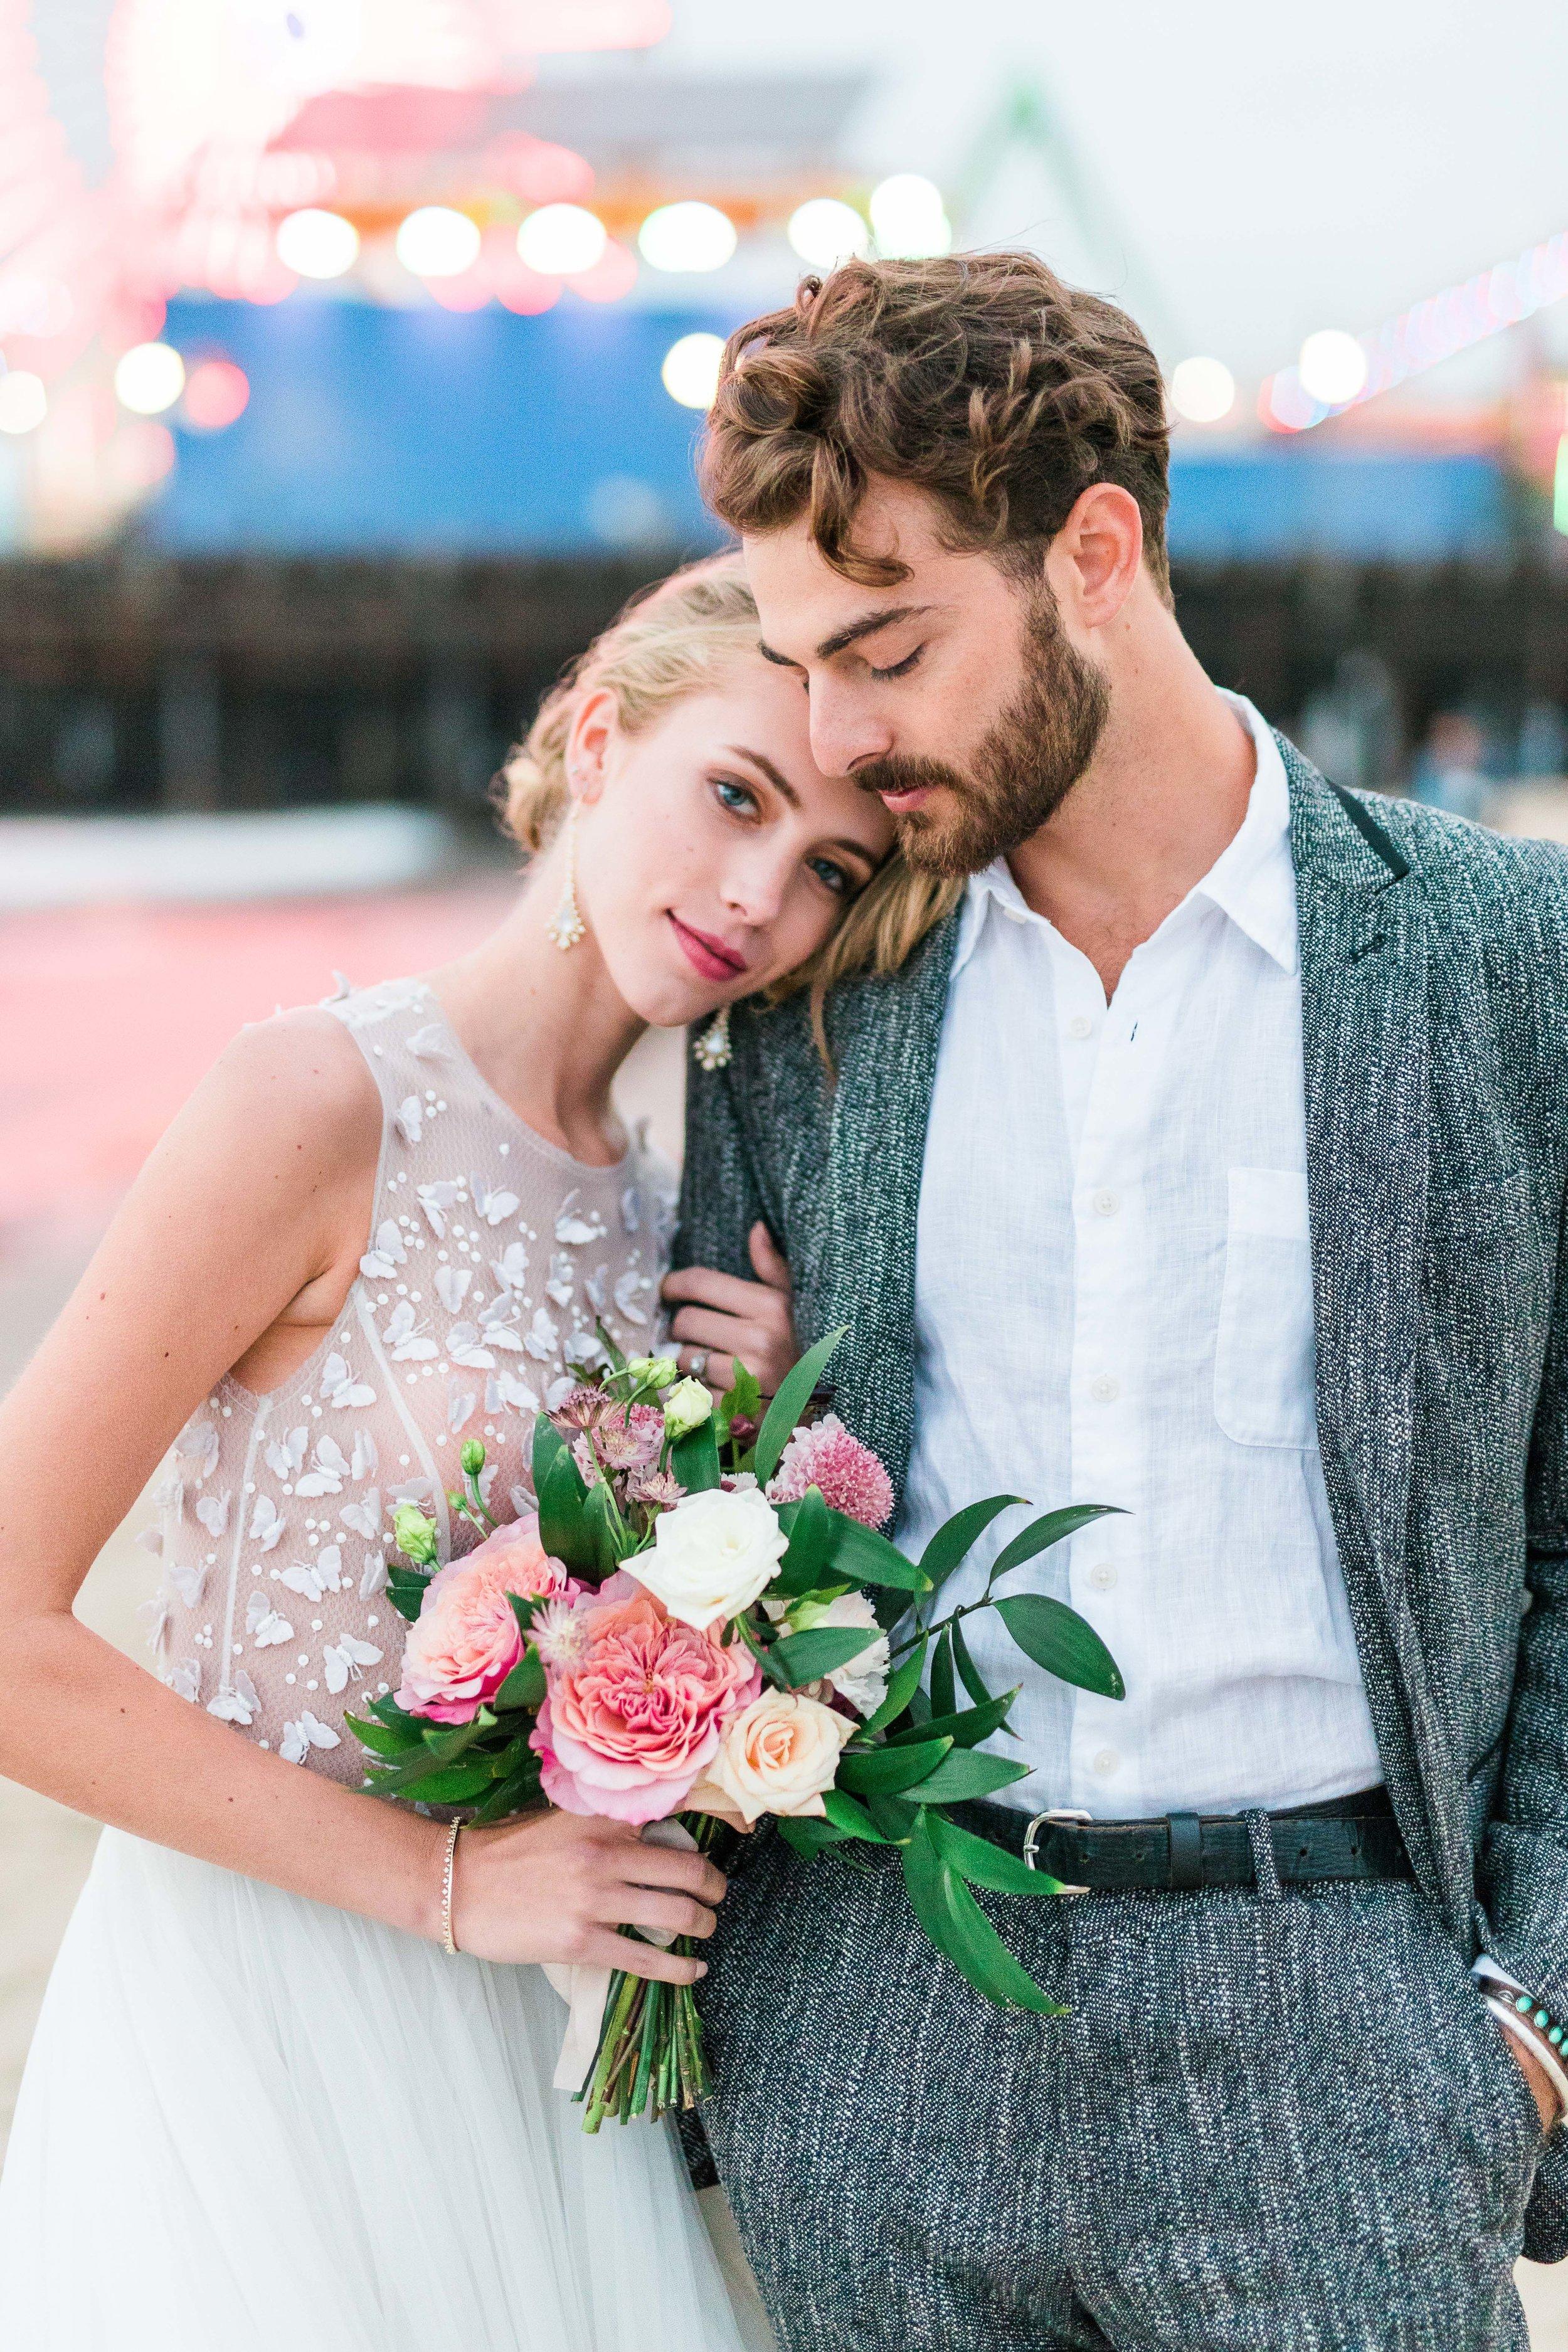 LA-Wedding-Shoot-by-JBJ-Pictures-180.jpg